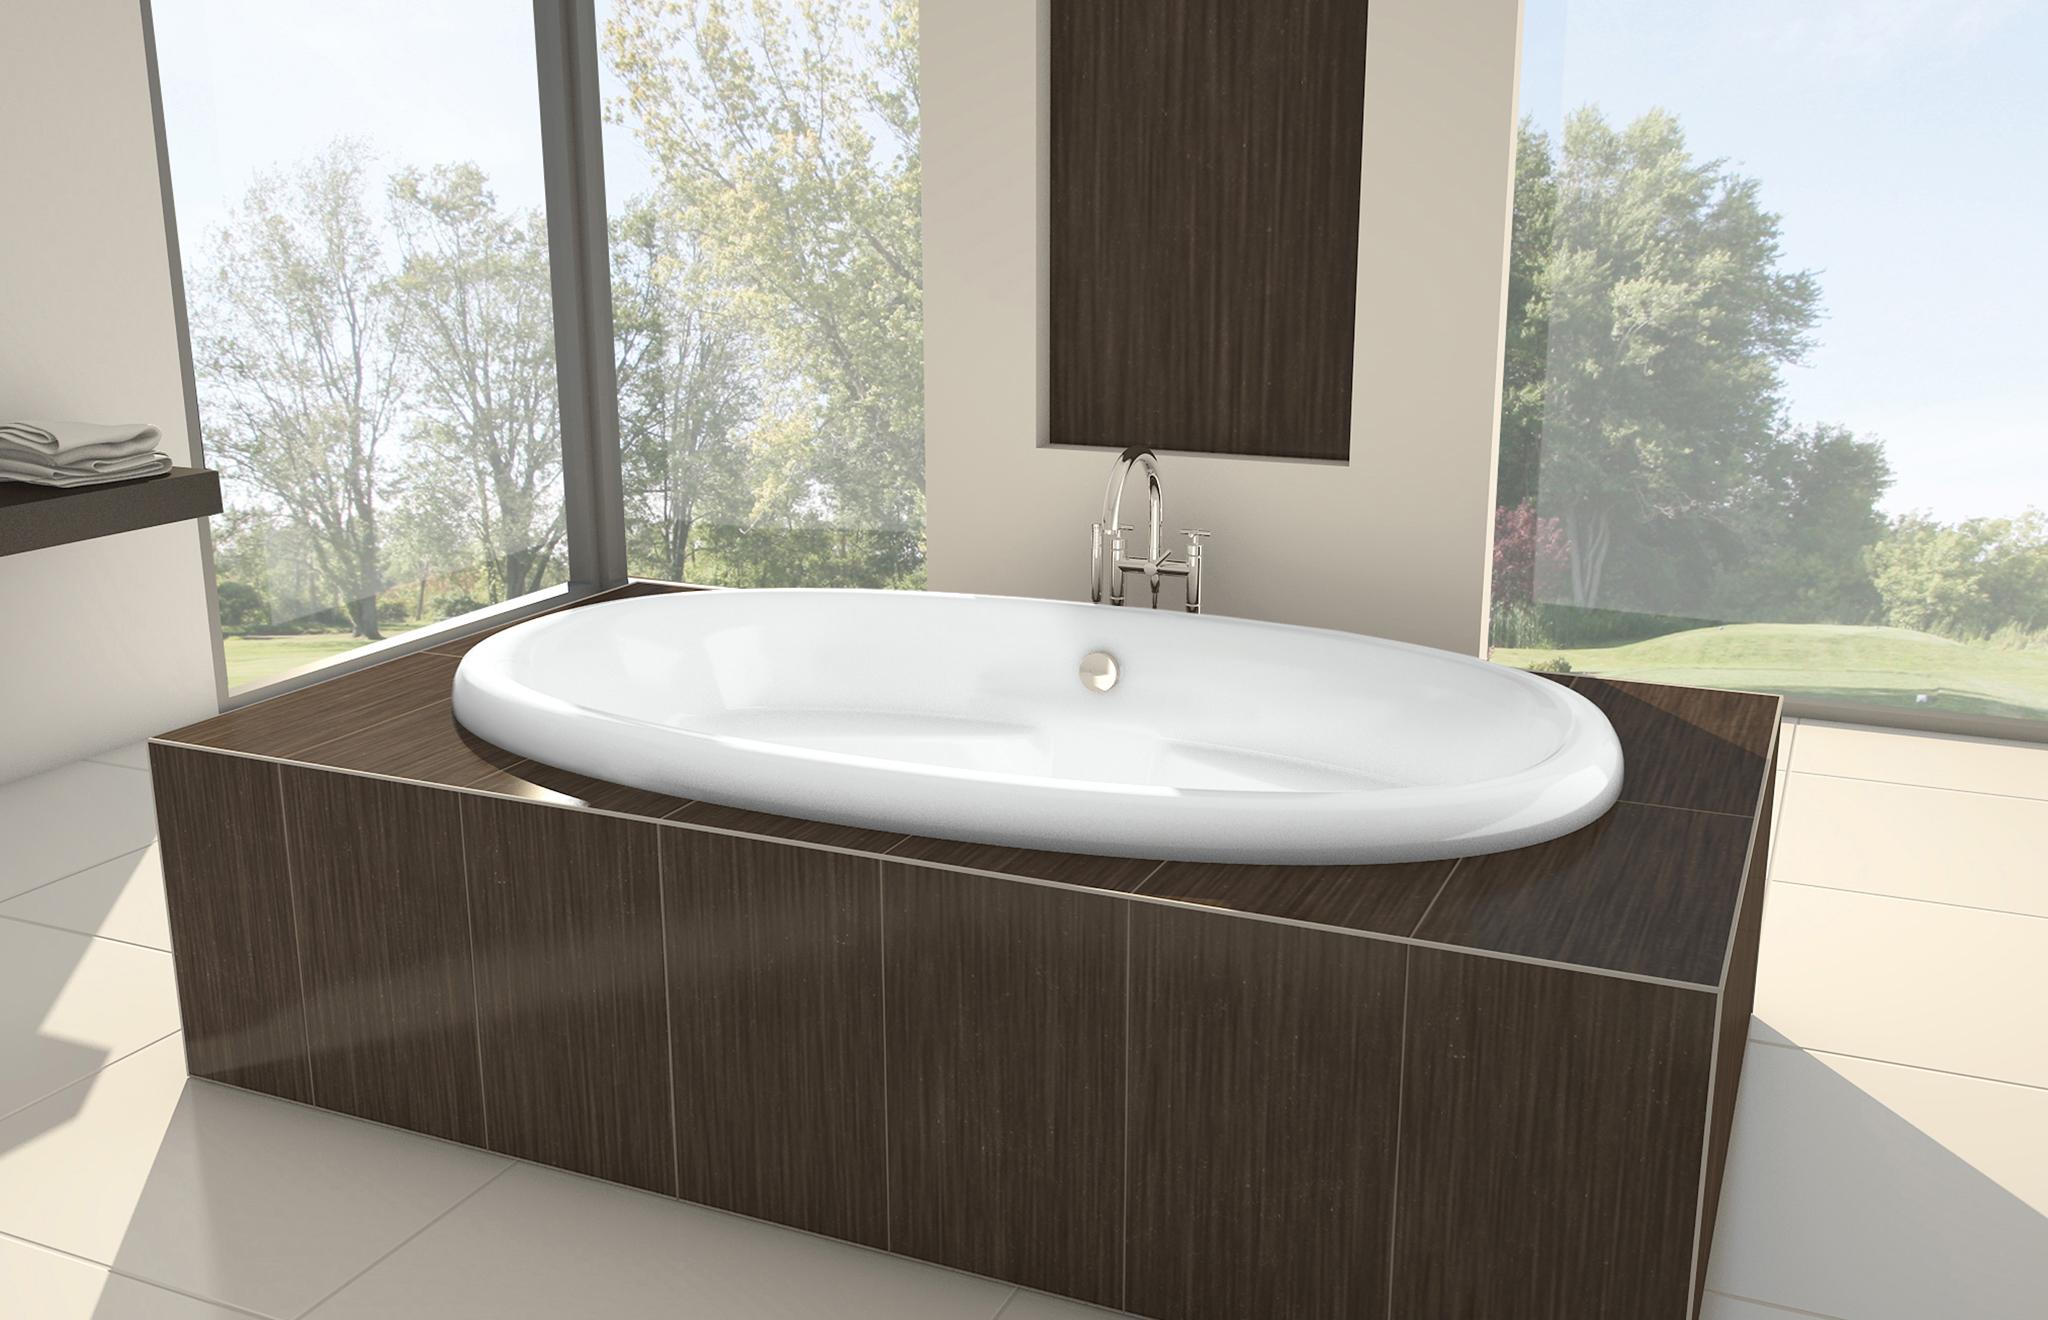 emejing tres grande baignoire images awesome interior. Black Bedroom Furniture Sets. Home Design Ideas